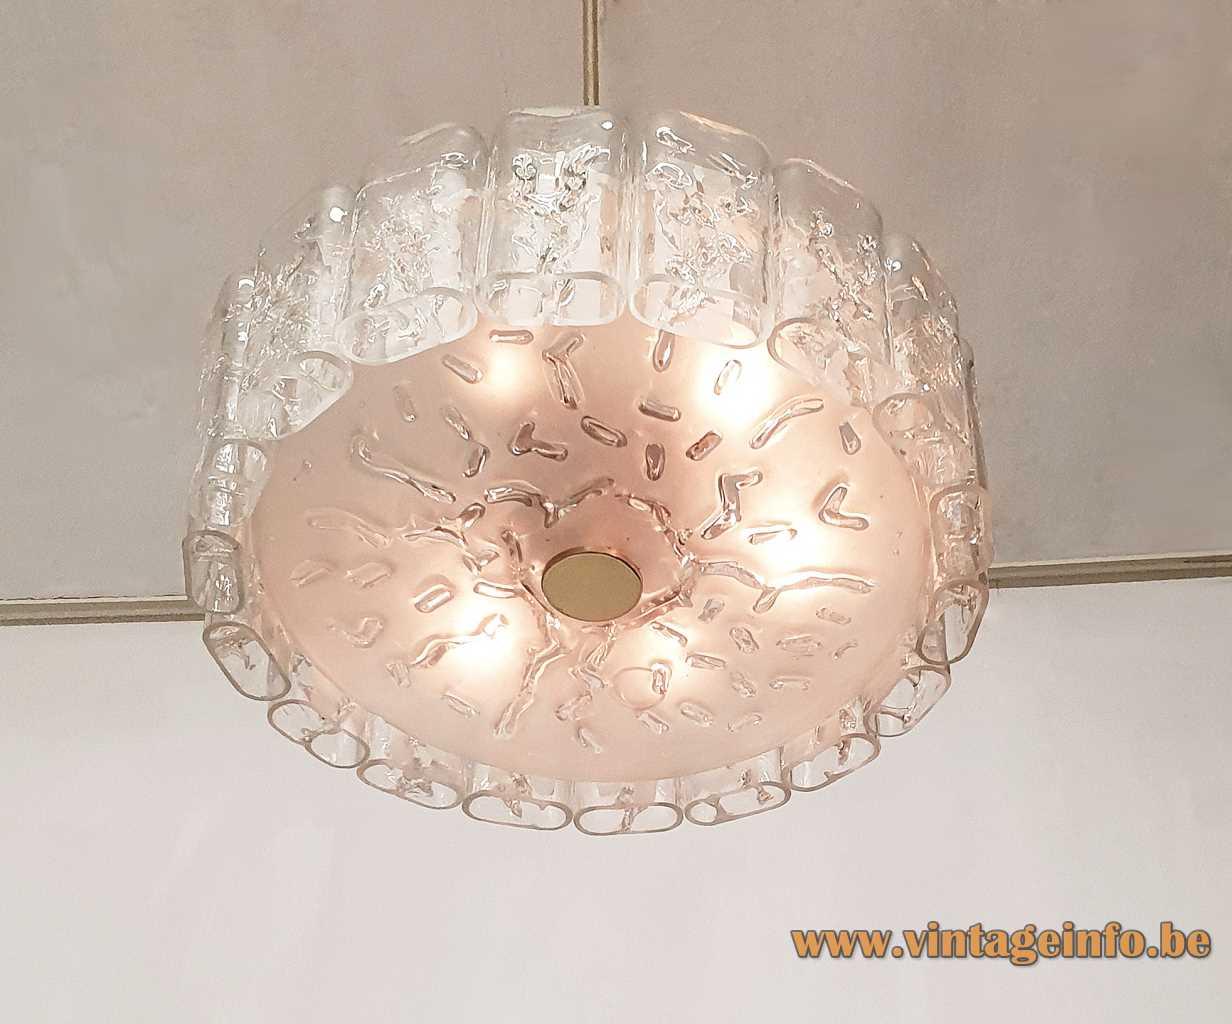 DORIA round ice glass chandelier 18 curved clear blocks big disc brass rod 1970s Germany vintage